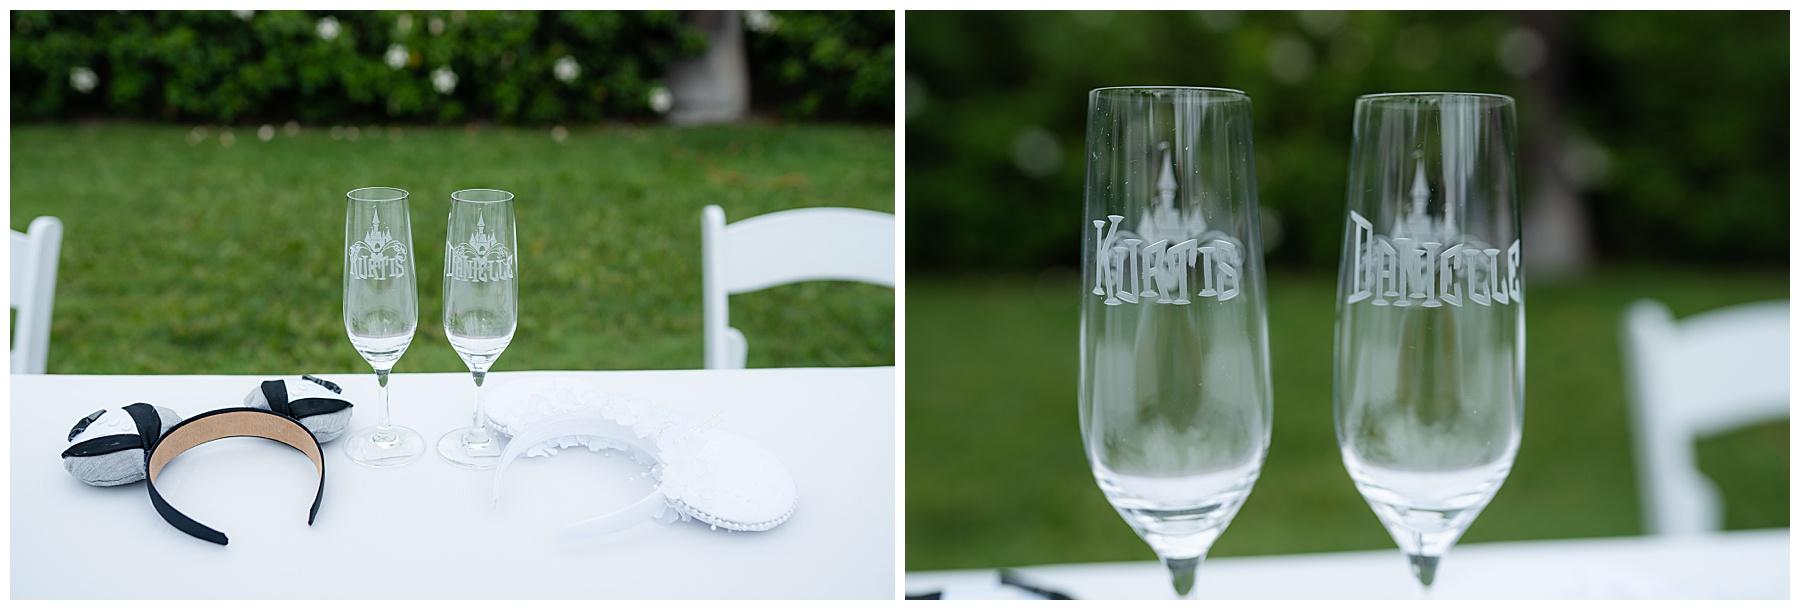 engraved disney champagne glasses